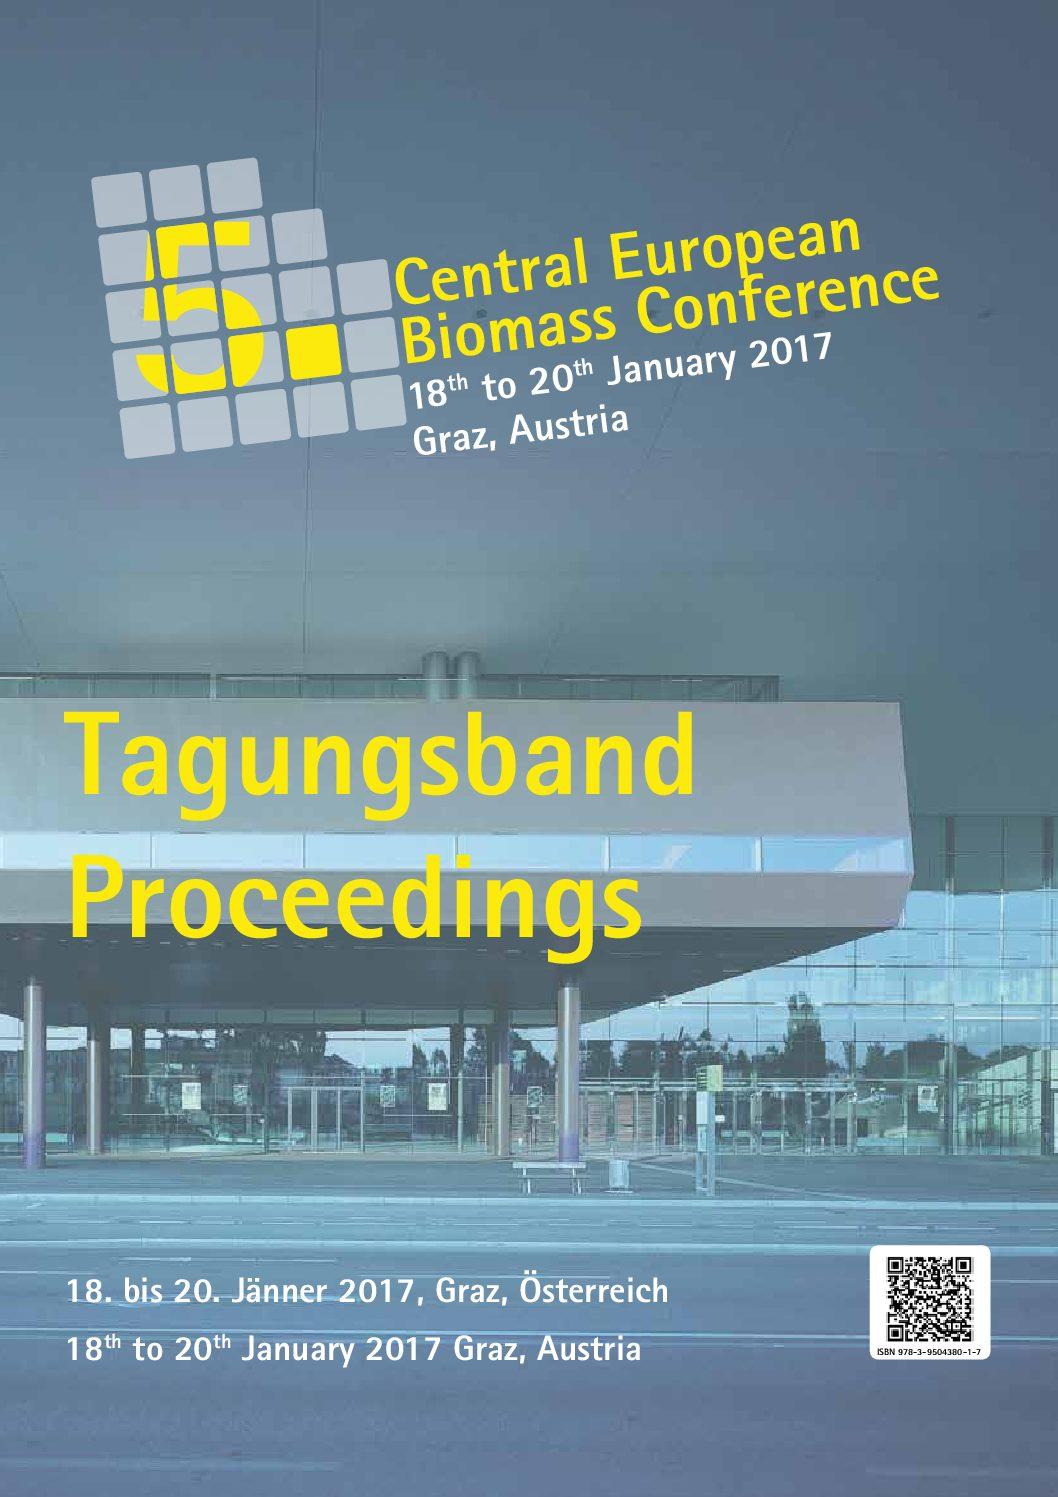 Tagungsband / Conference Proceedings CEBC 2017